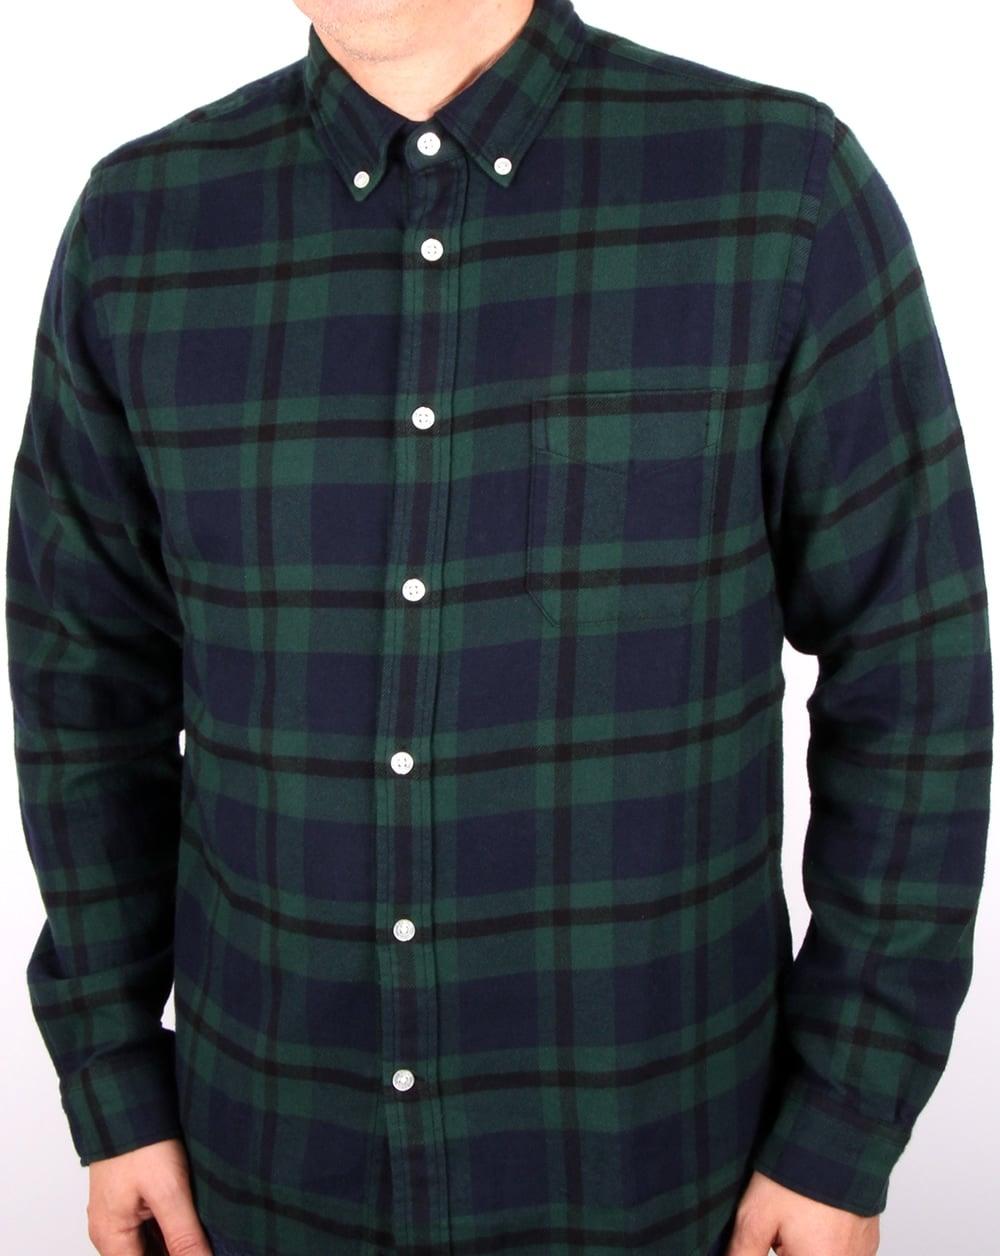 Edwin jeans edwin standard light flannel shirt black for Flannel shirt and jeans